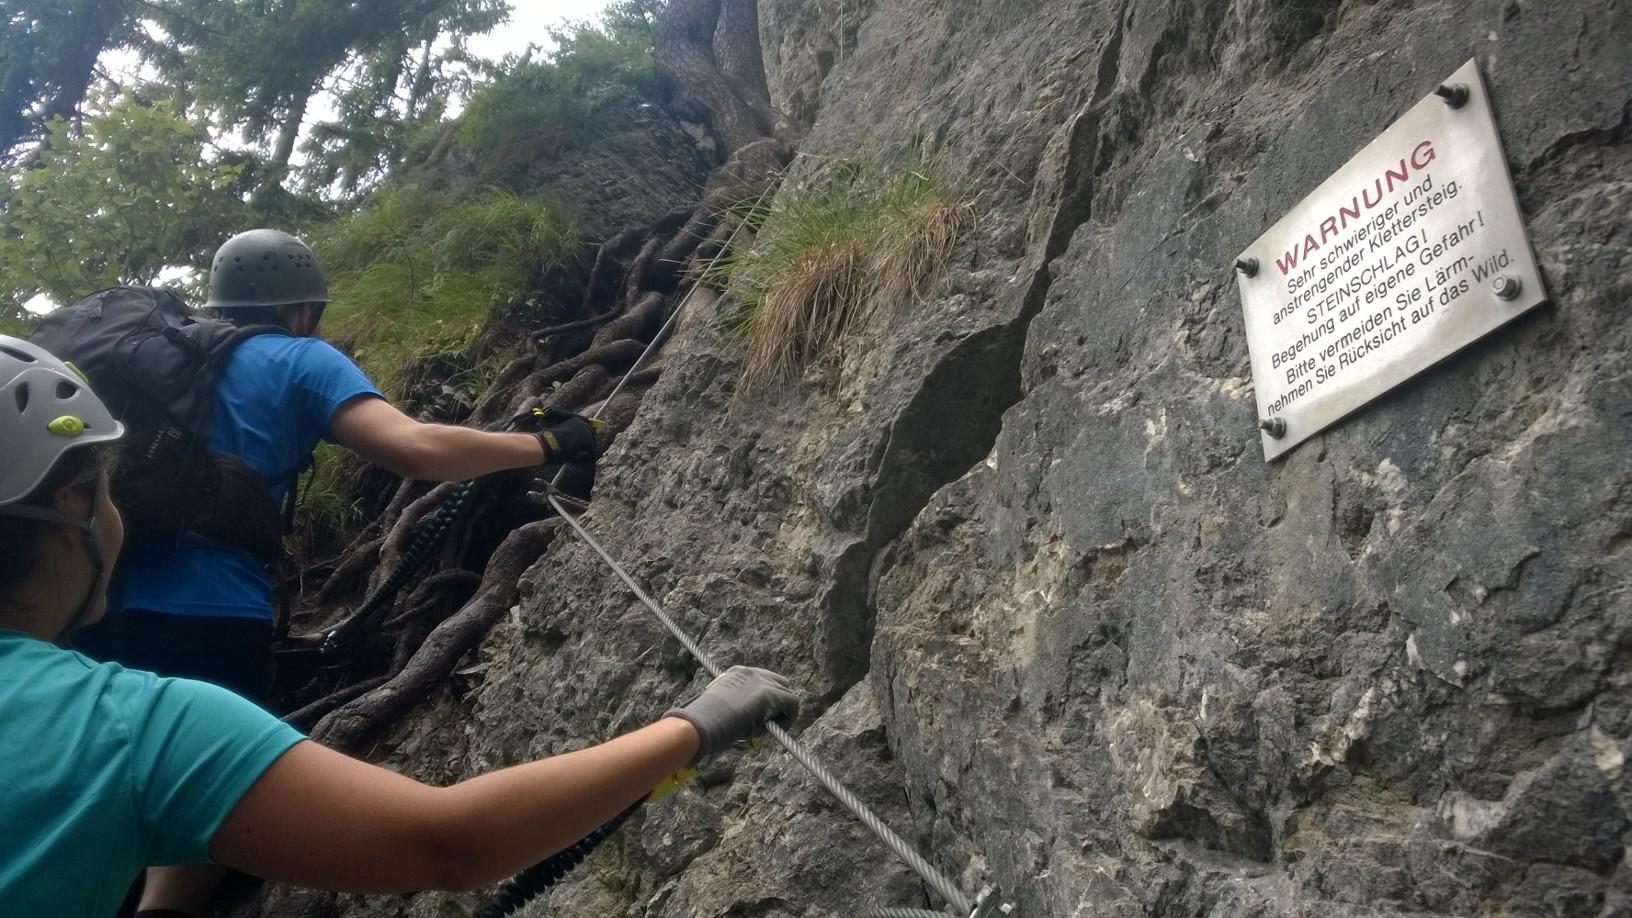 Klettersteig Via Kapf : Via kessi kapf klettersteige am bodensee youtube